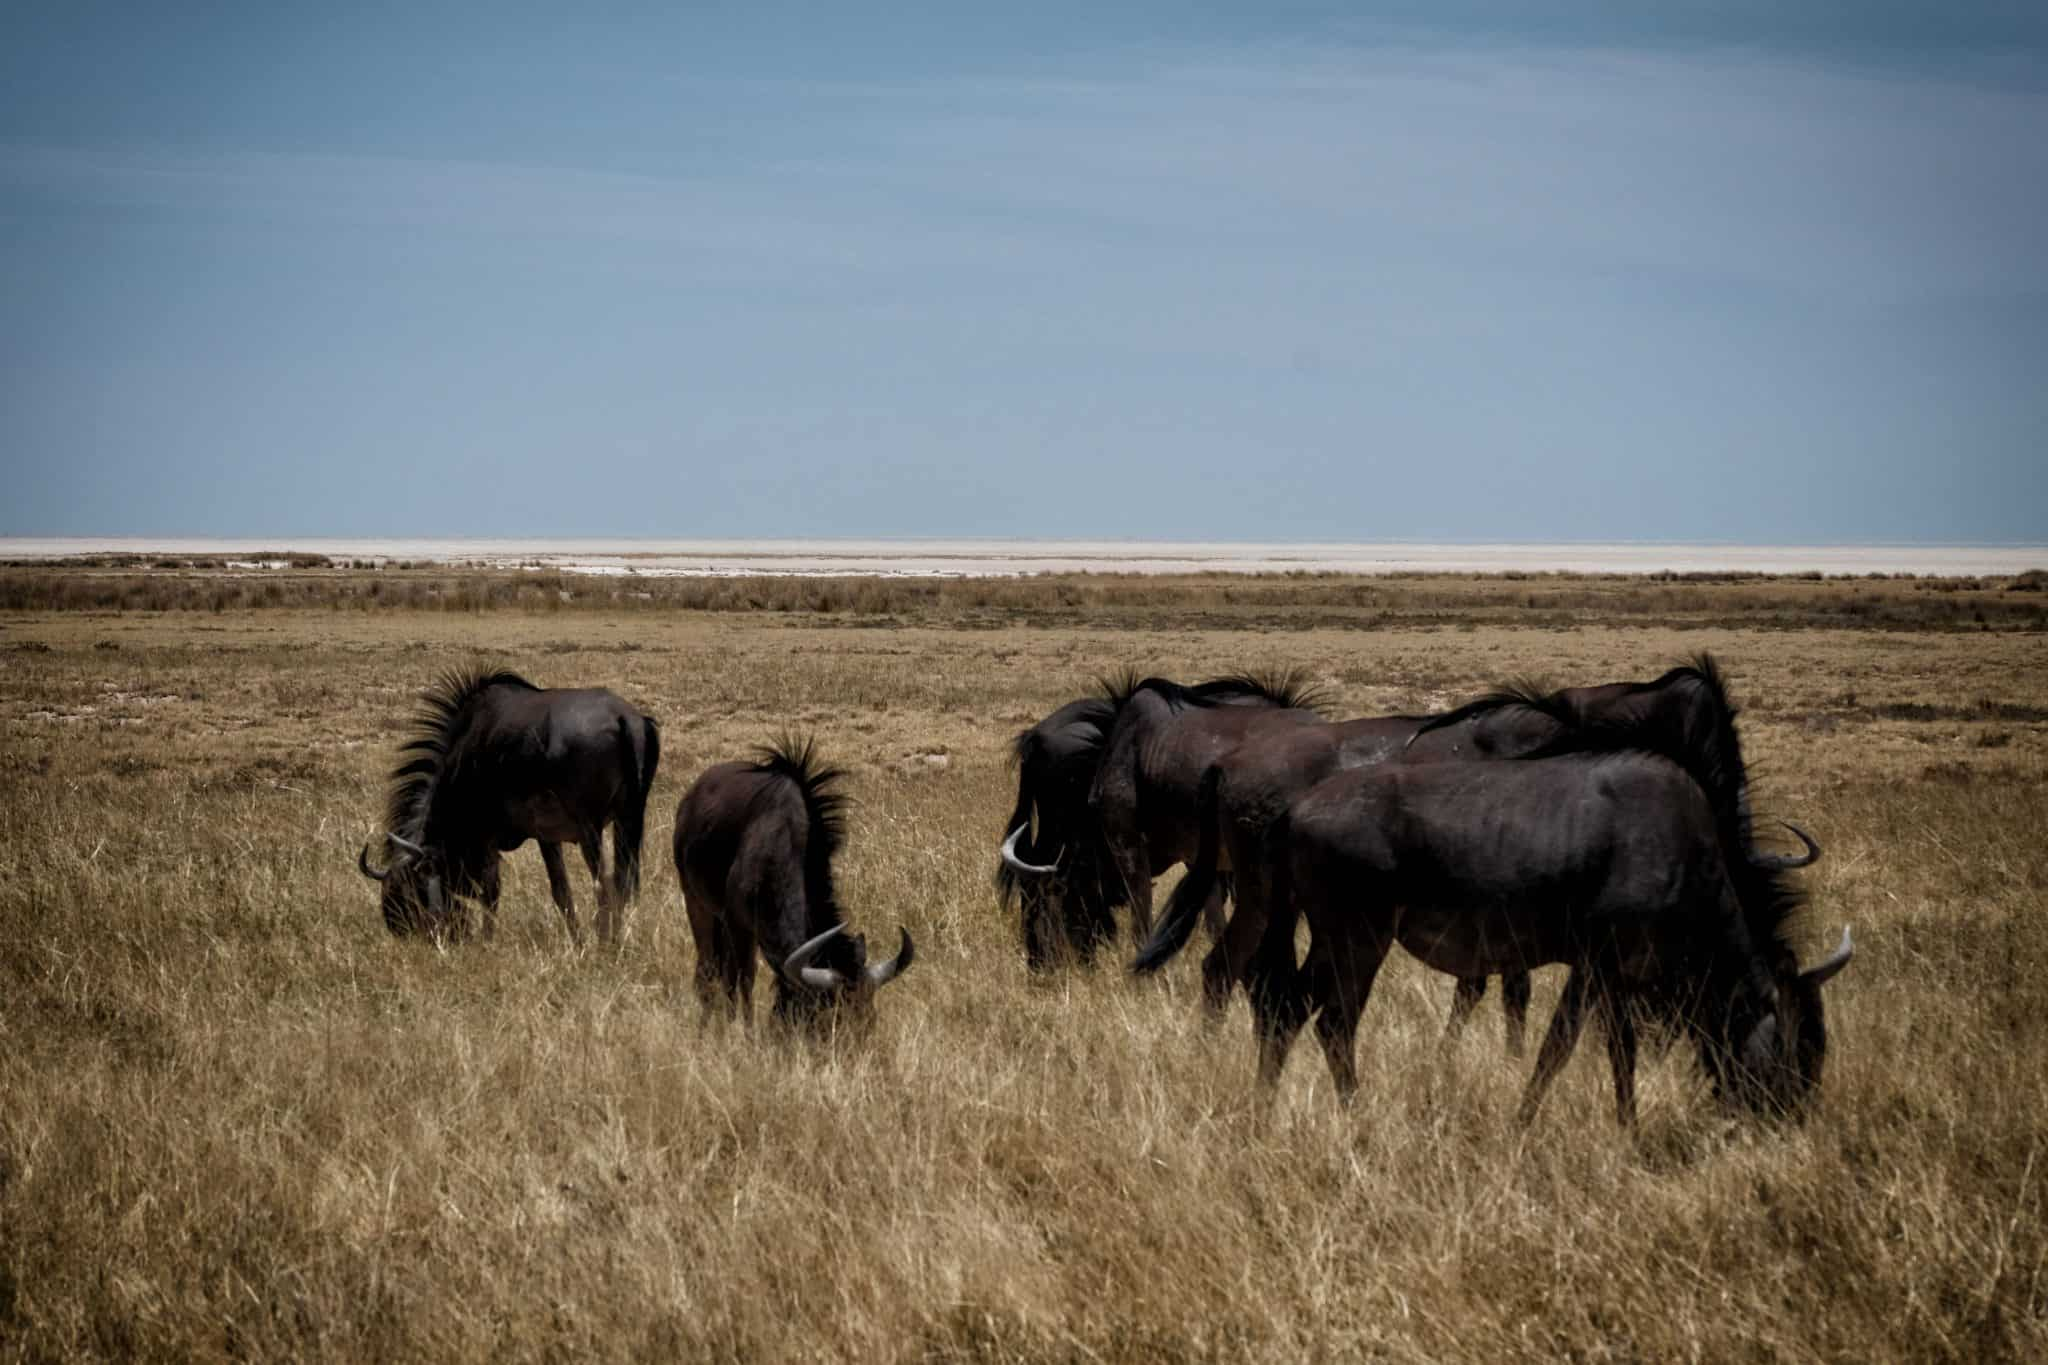 Etosha National Park Wildebeest